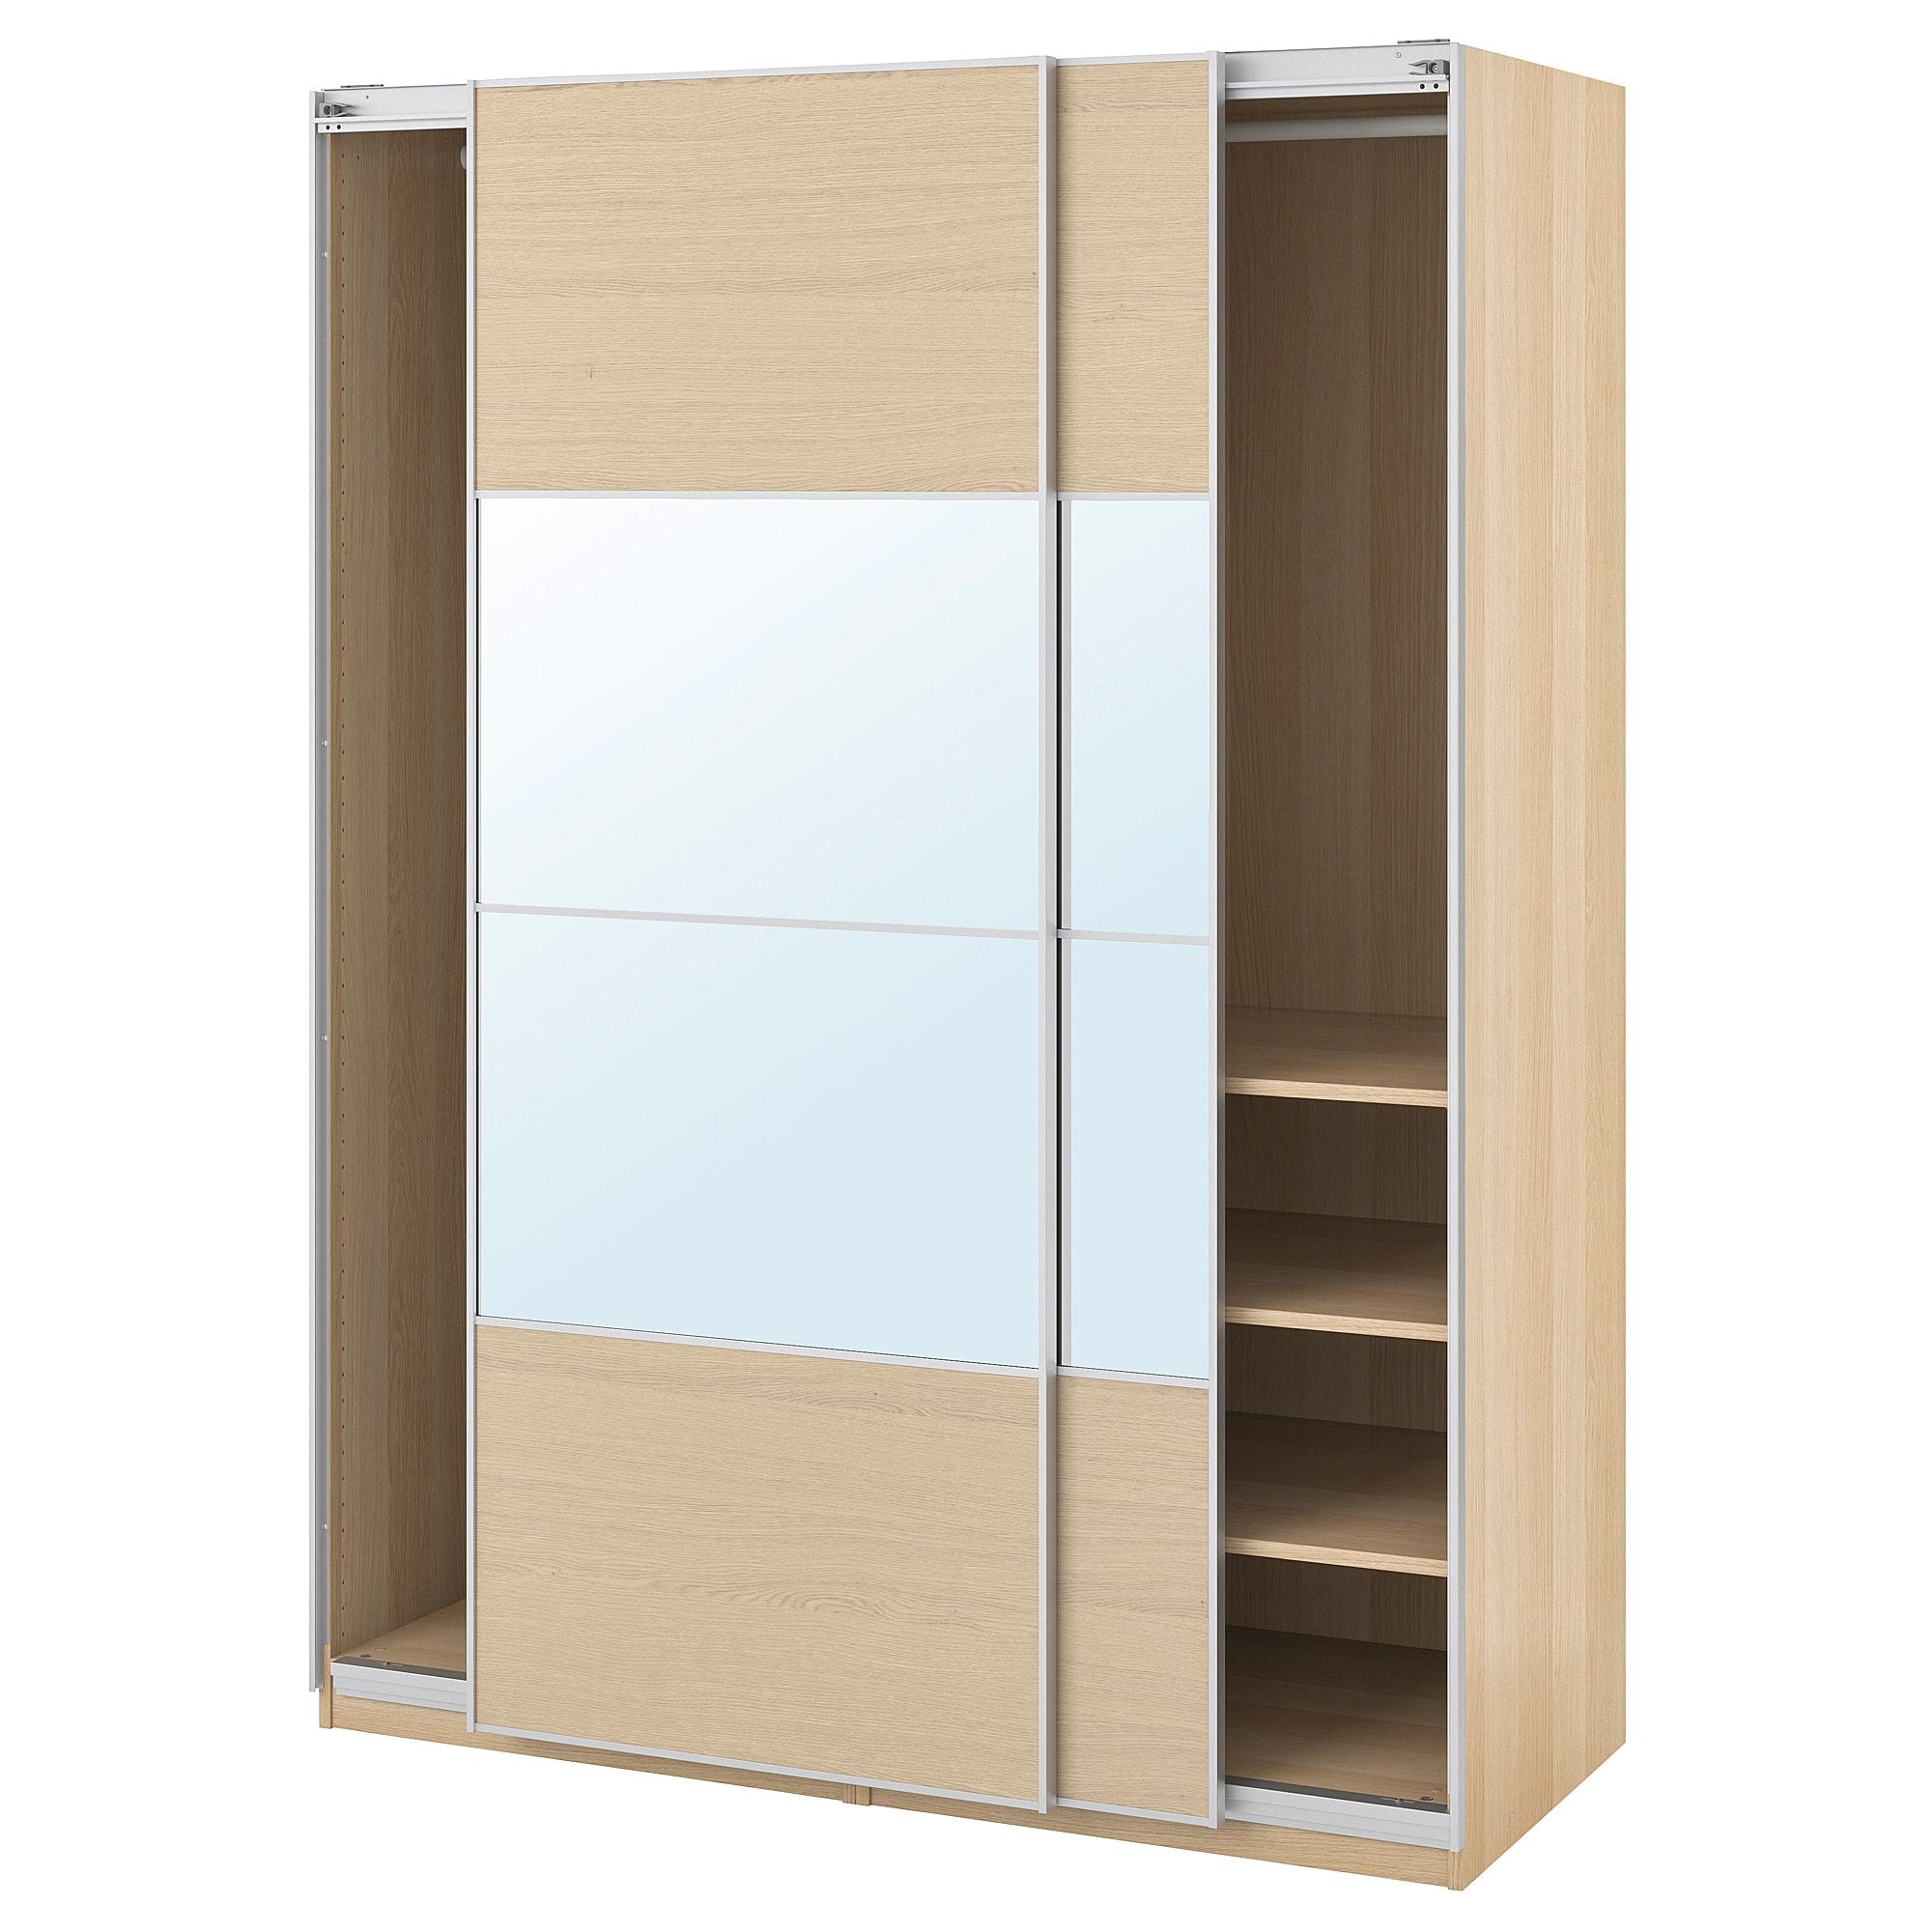 Bedroom Solution Space Saving Customized Wardrobe Plastic Sliding Door  Sliding Closet Doors Mdf Bedroom Wardrobe - Buy Sliding Closet Doors Mdf ...